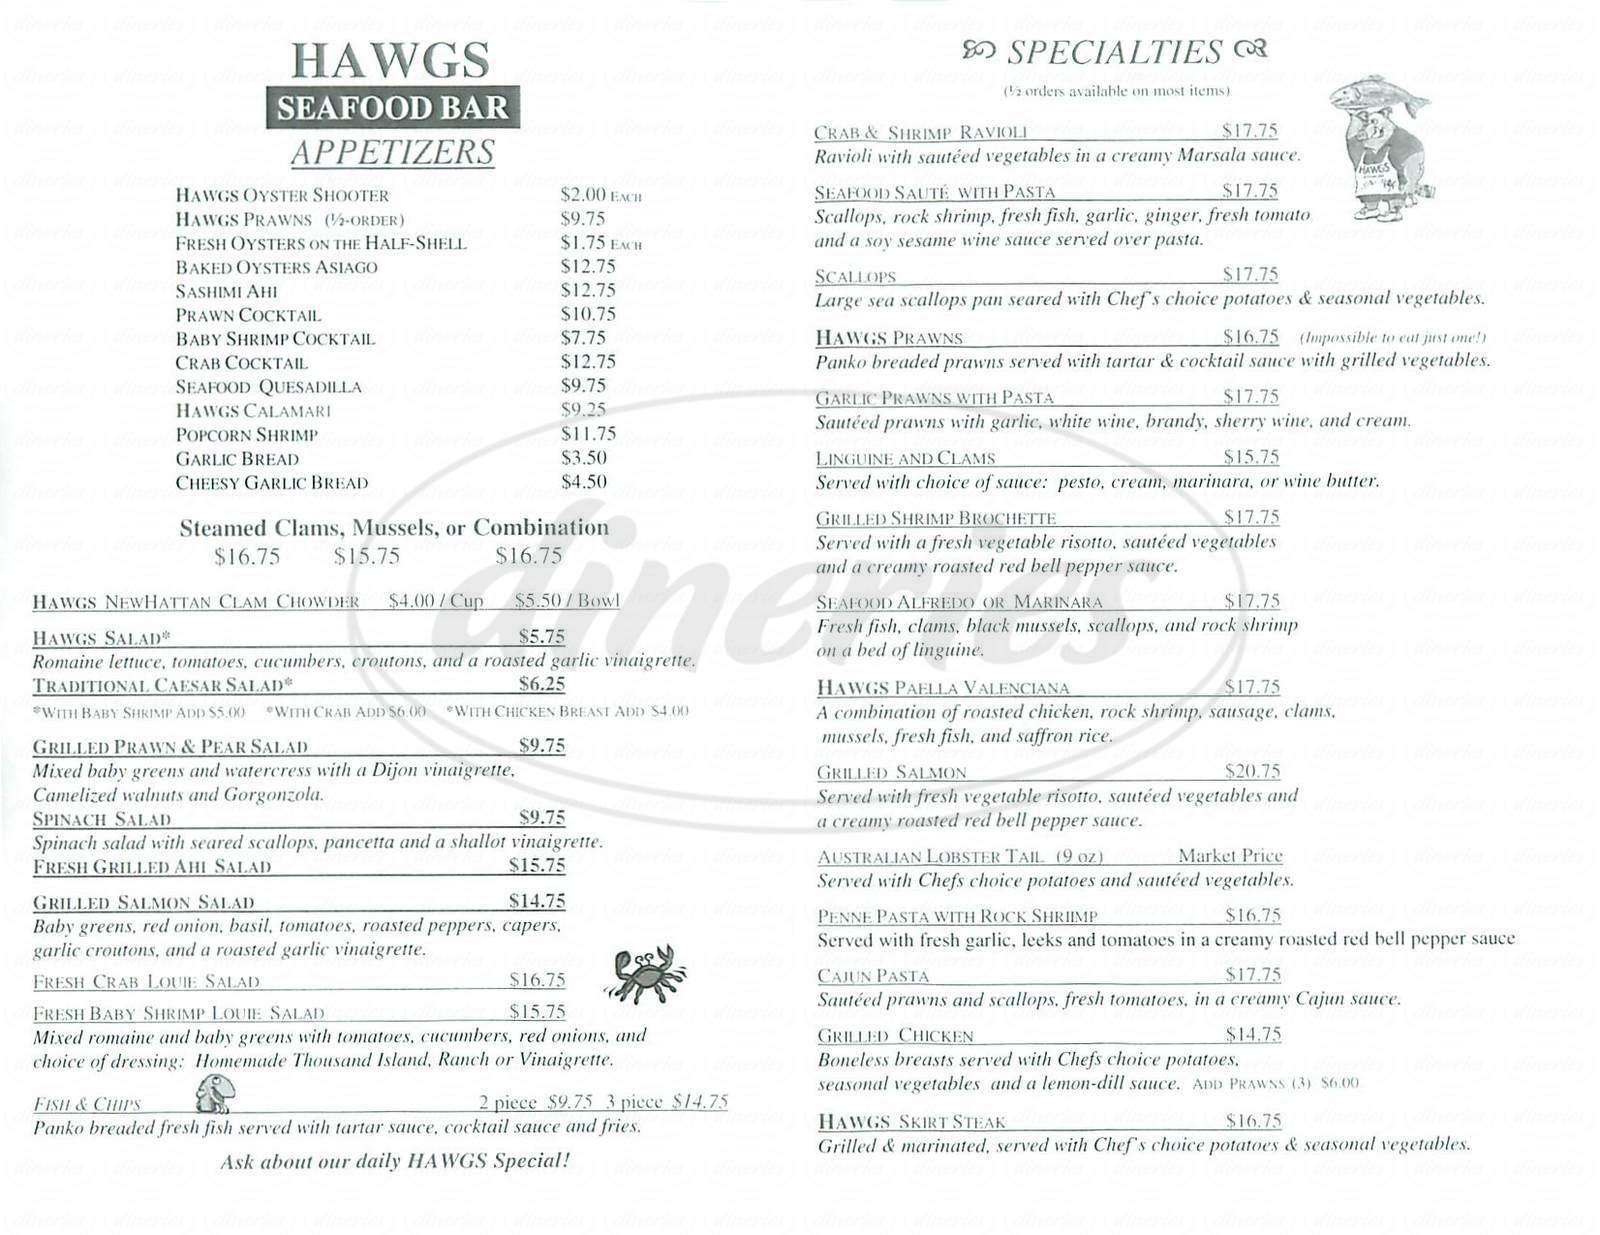 menu for Hawgs Seafood Bar